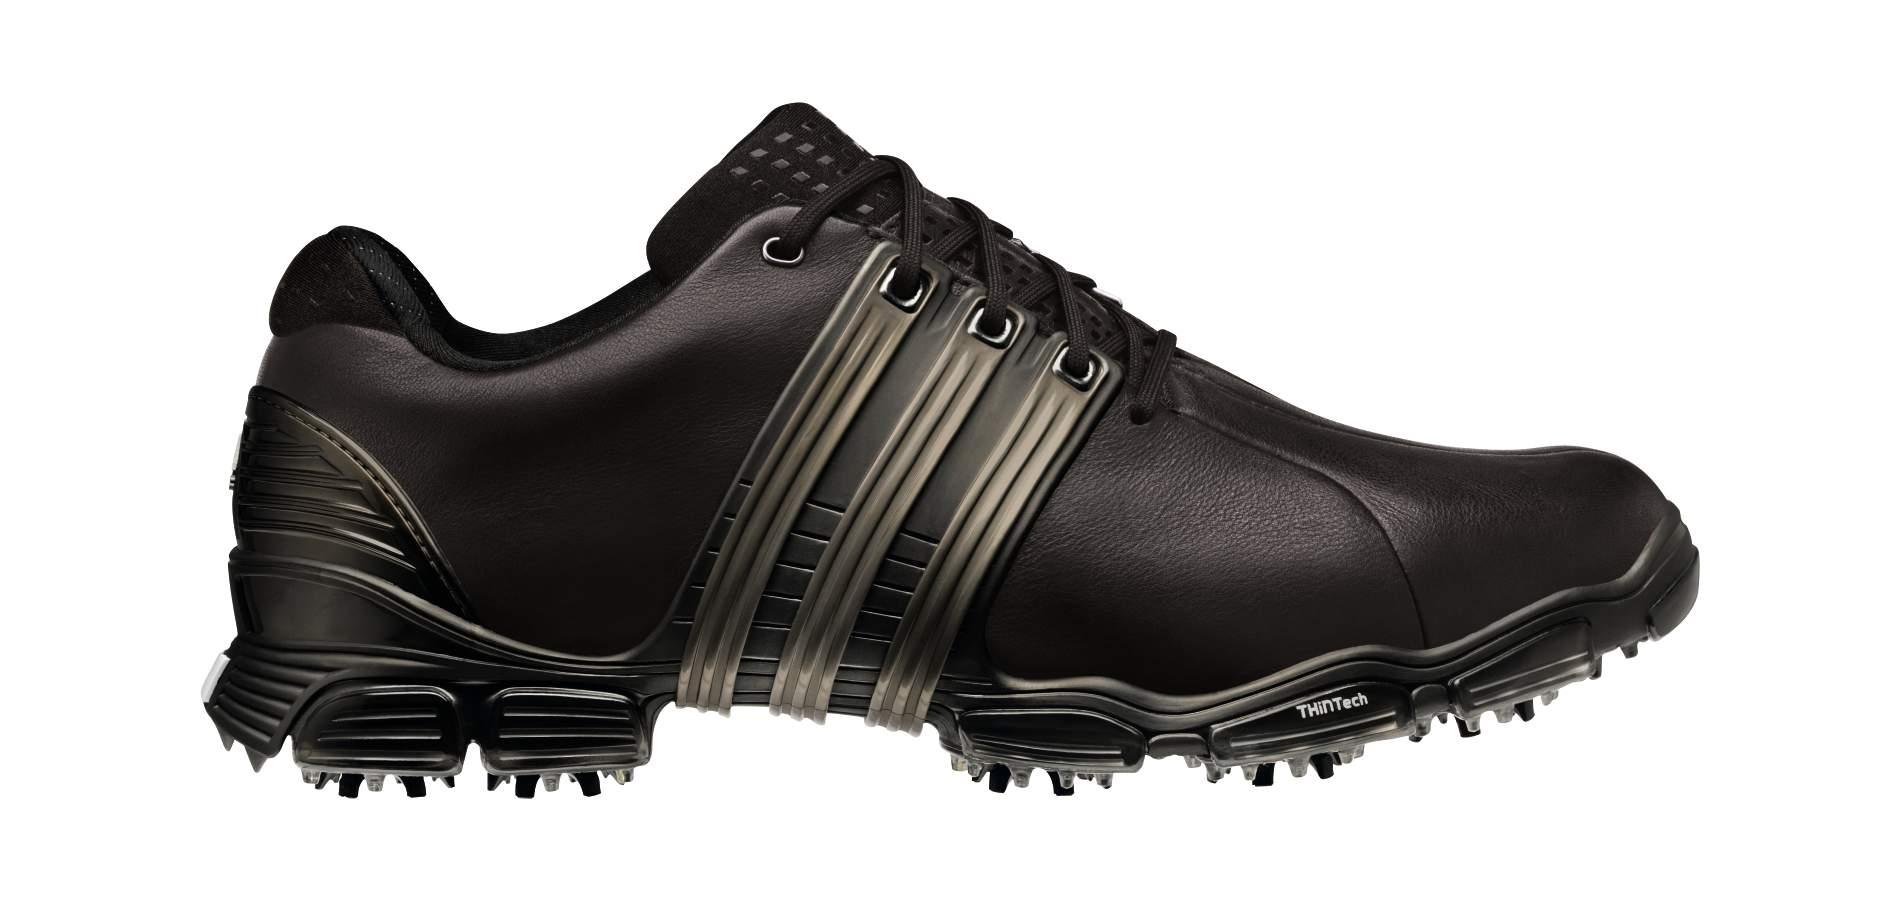 TaylorMade-adidas Golf 2010: The Lowdown